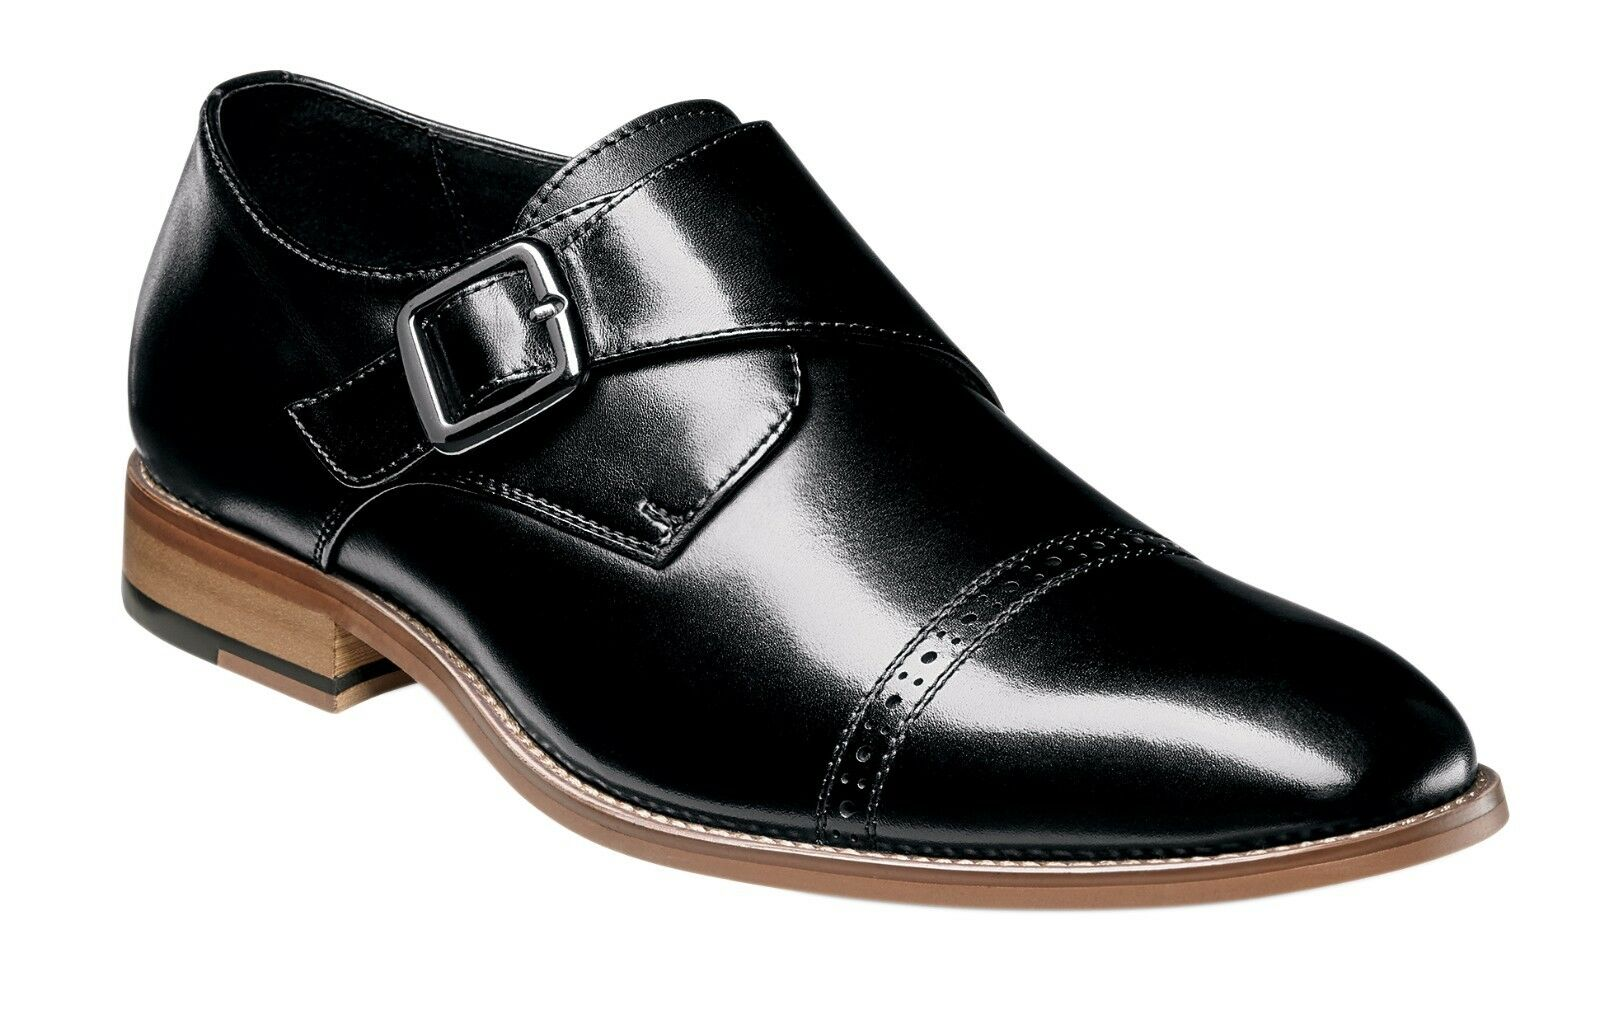 Stacy Adams Para Hombre Desmond Cap-Toe Monje-Strap Slip-on Loafer-Negro